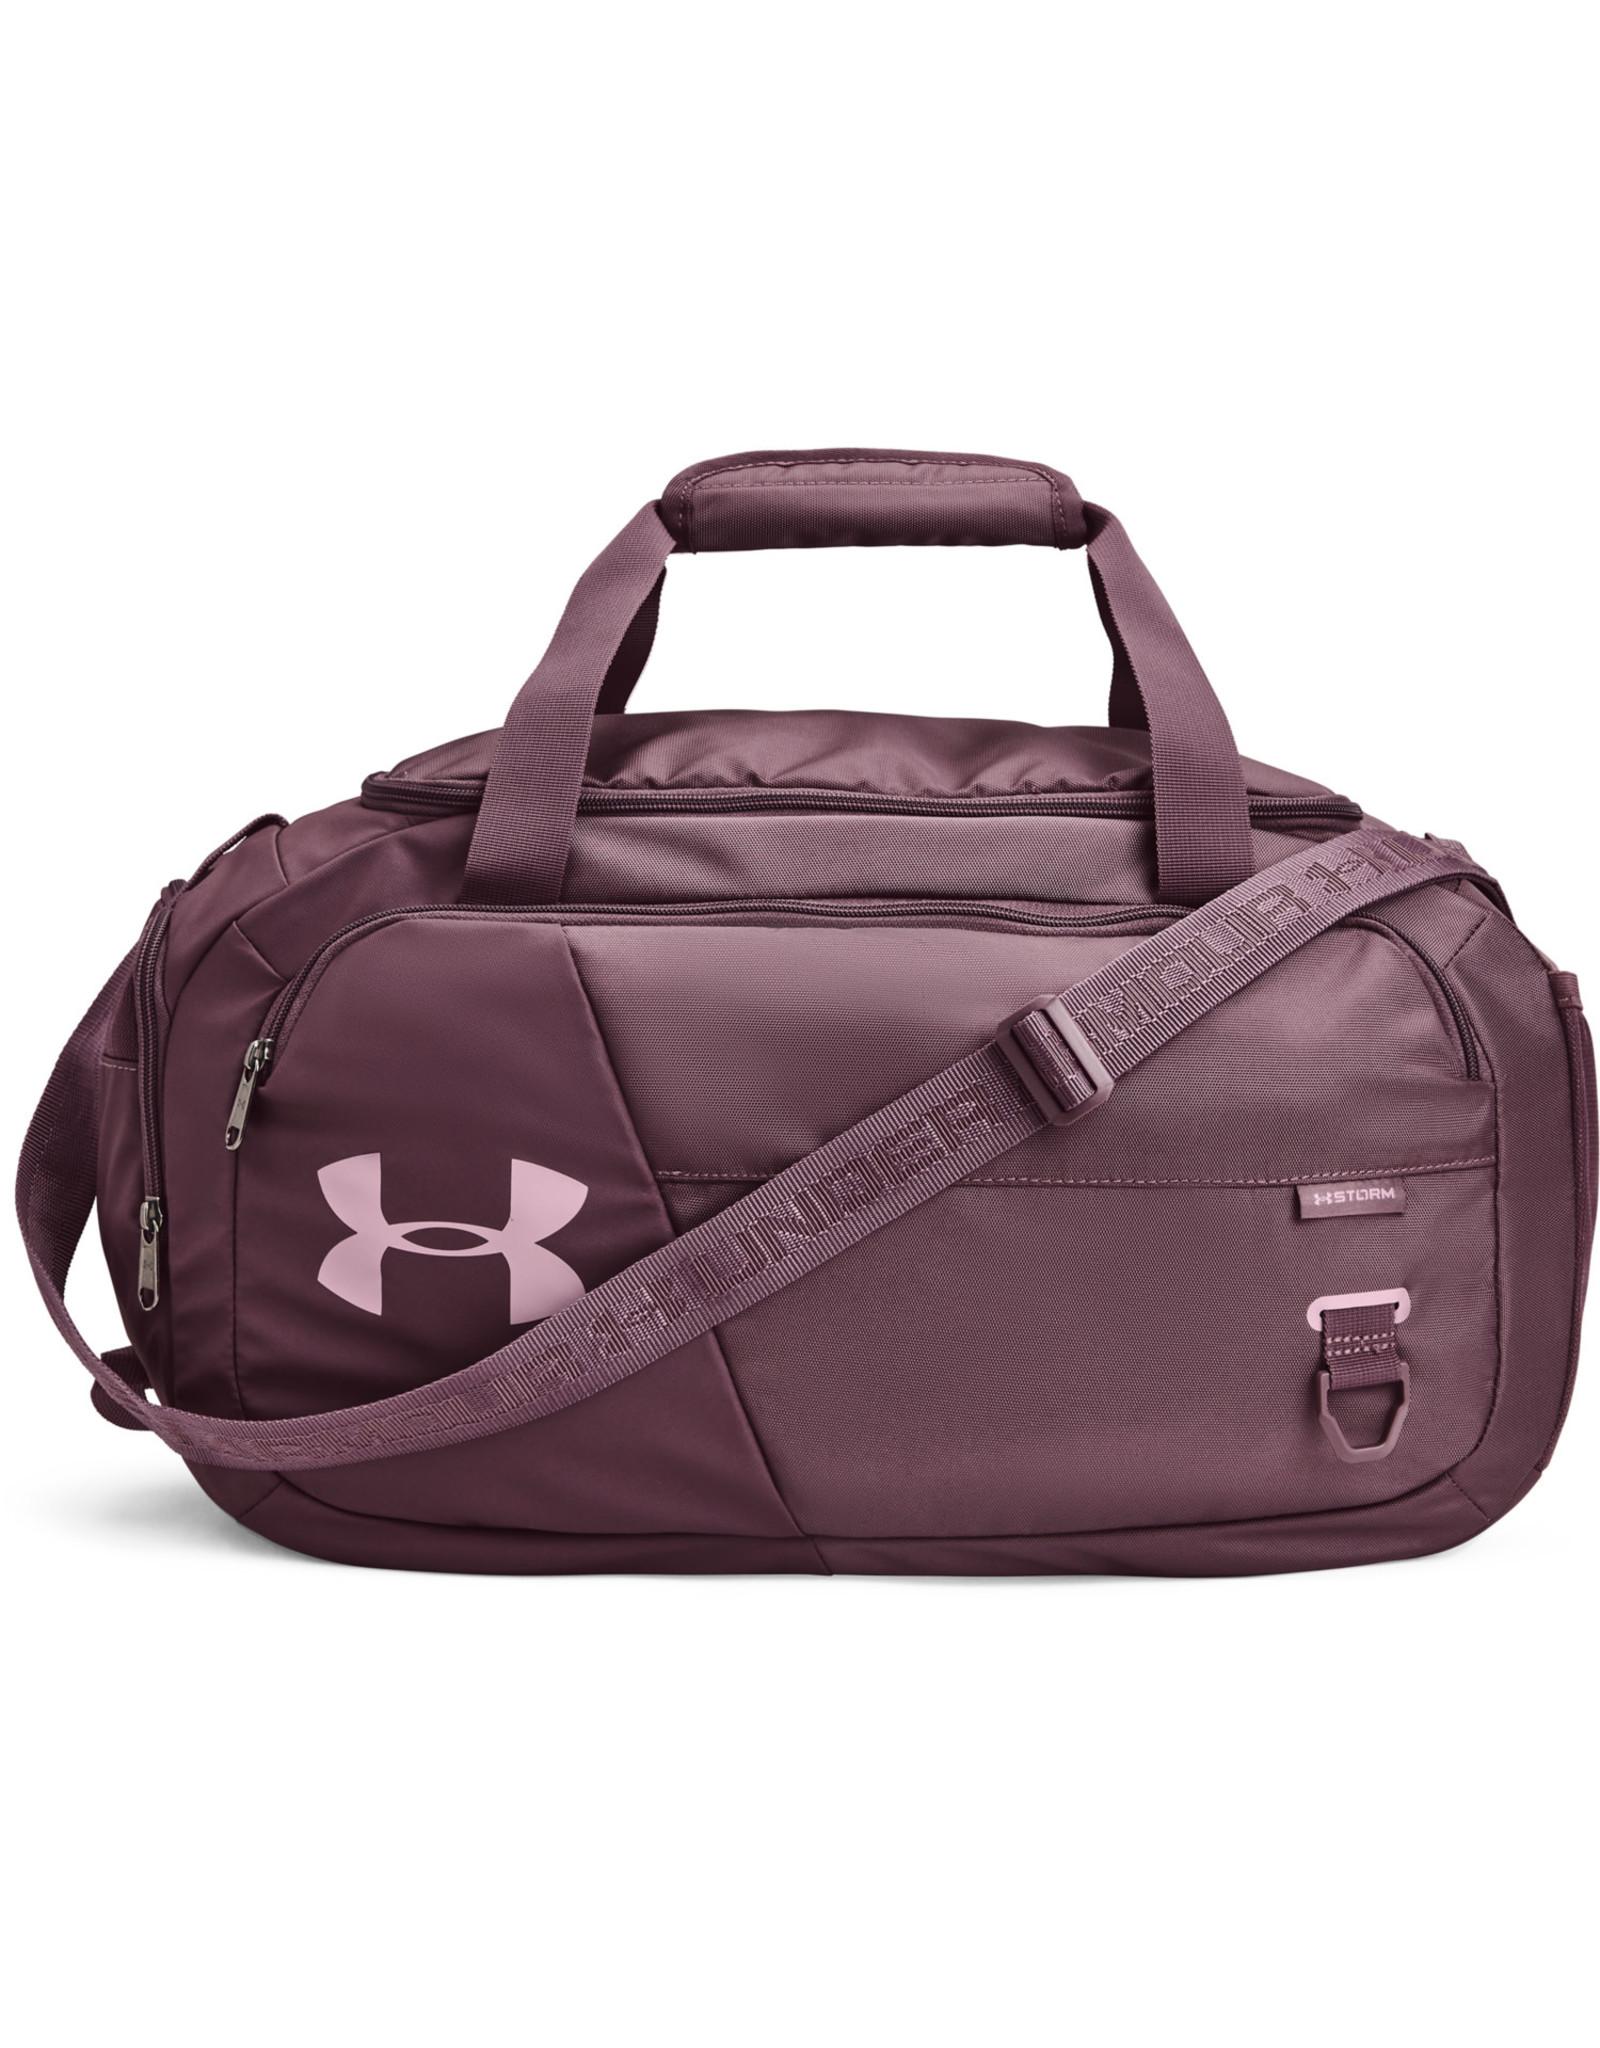 Under Armour UA Undeniable 4.0 Duffle XS-Purple